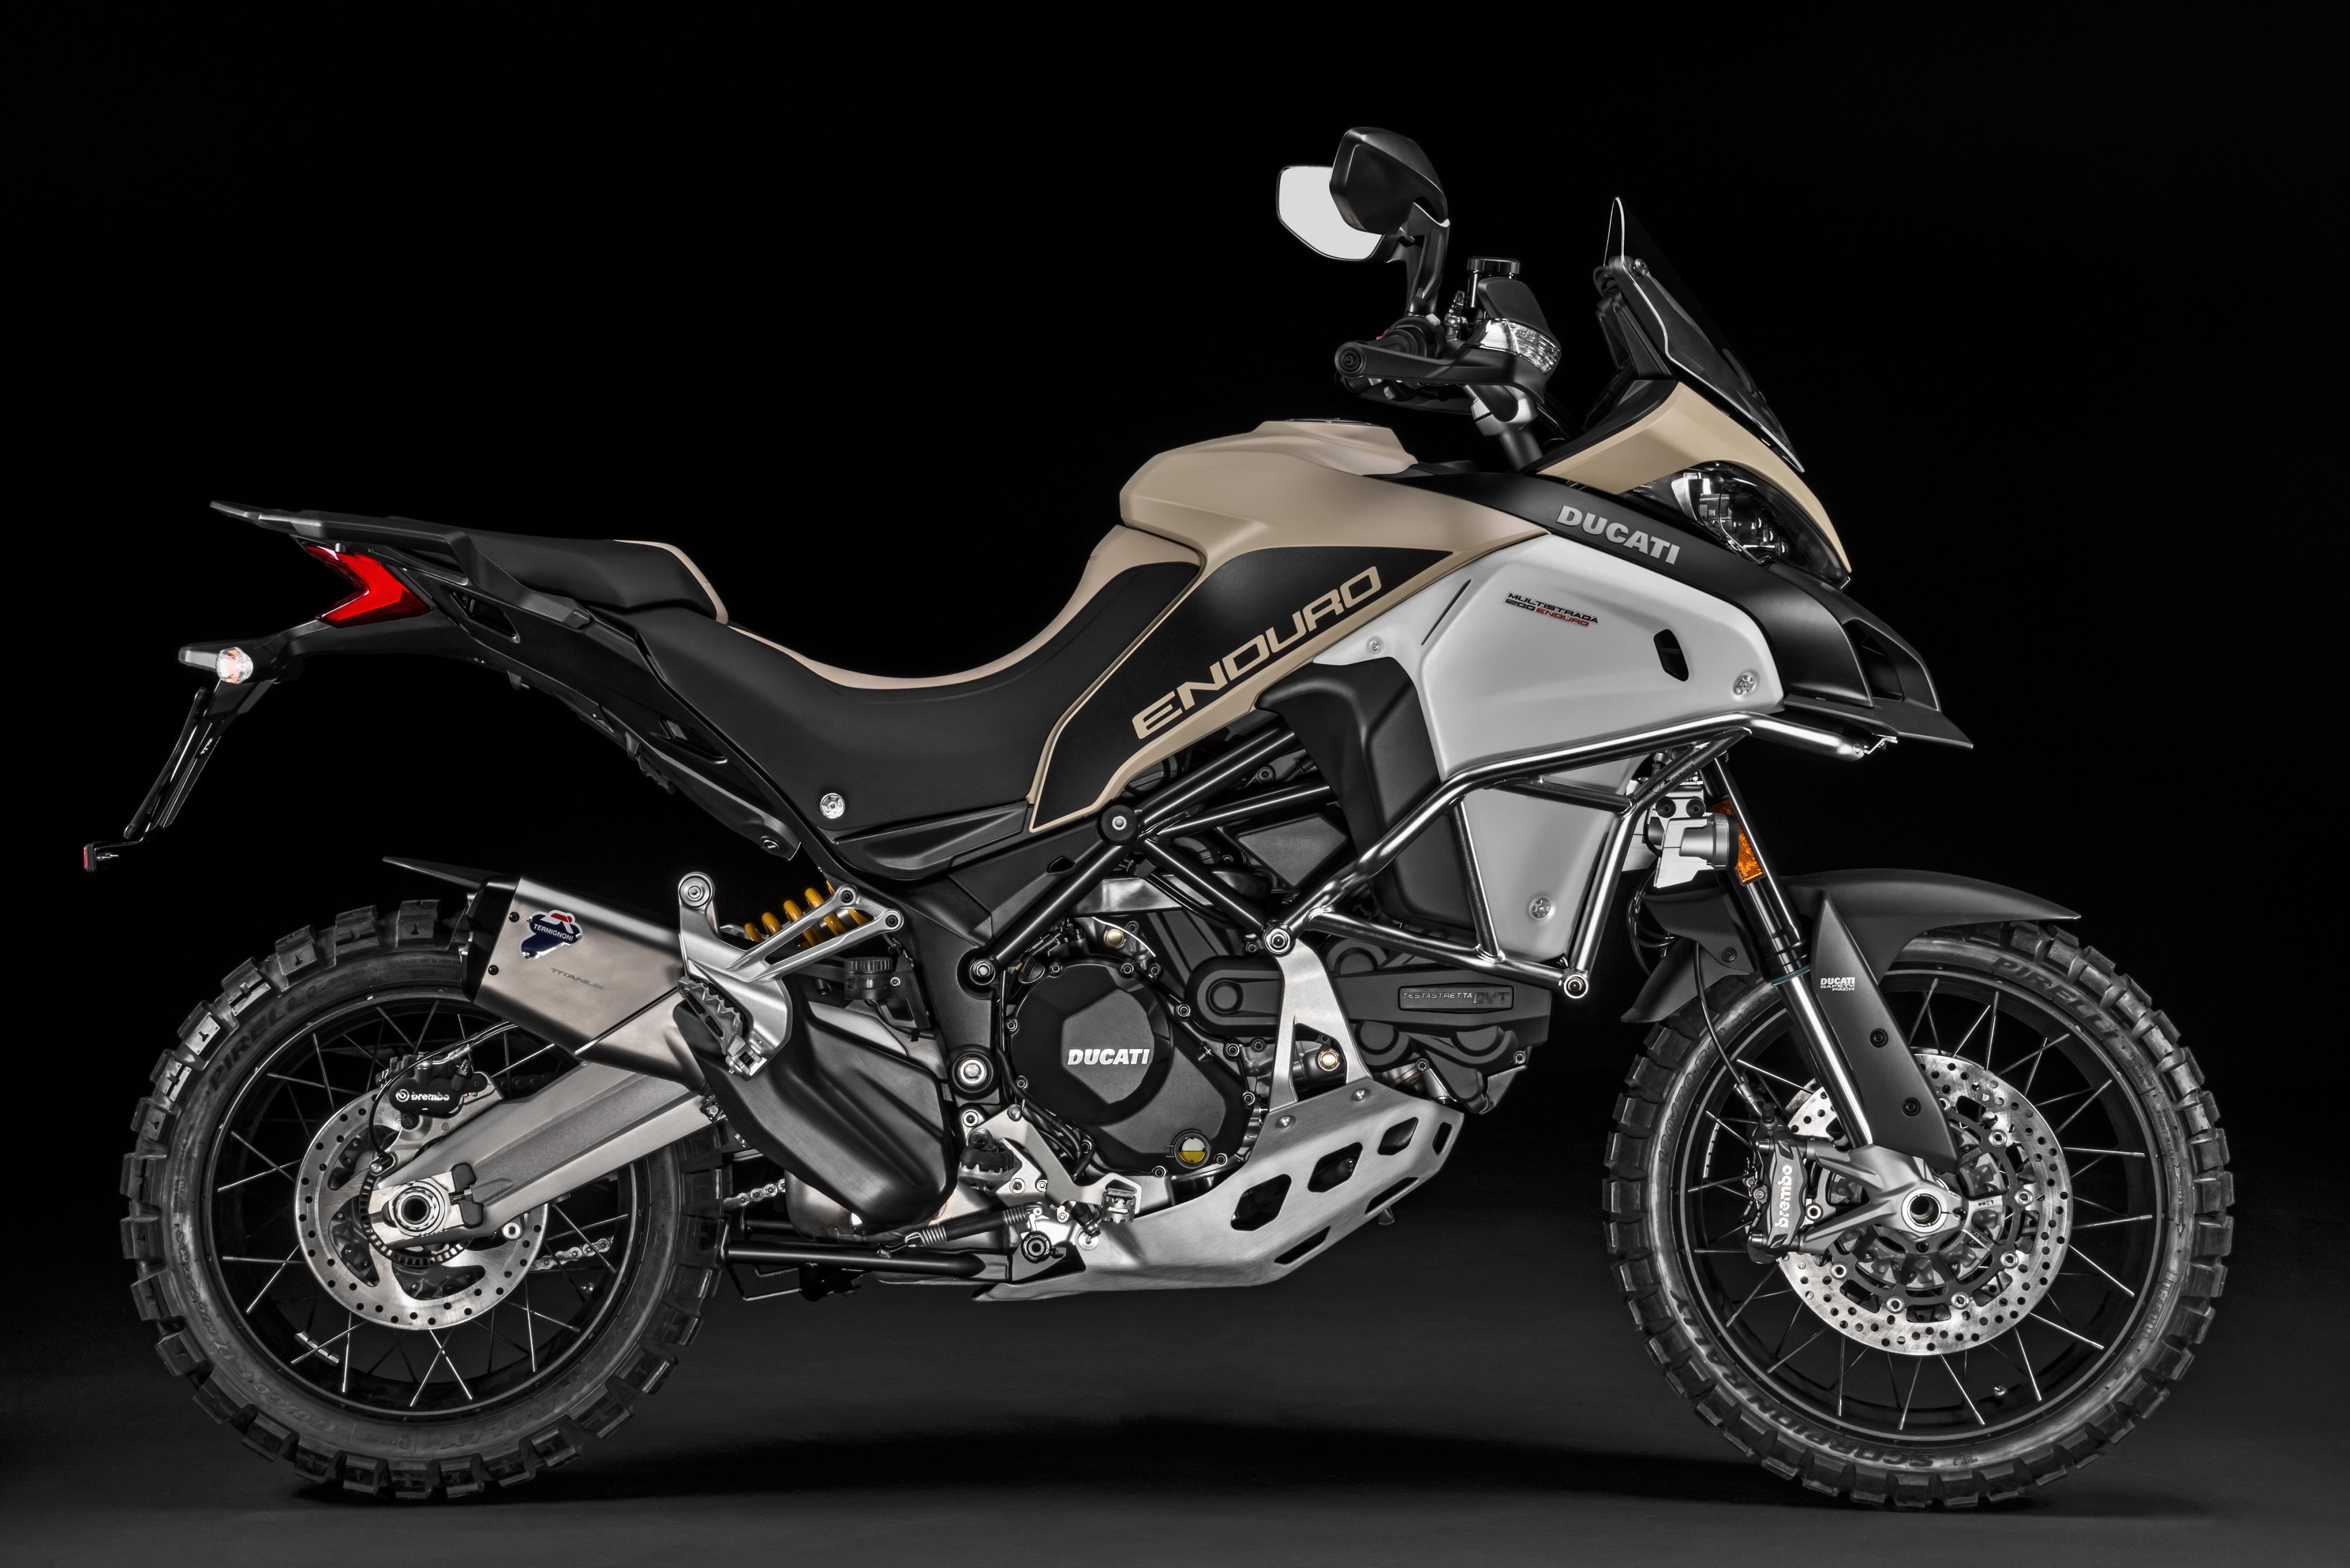 Ducati Multistrada 1200 Enduro 4k Ultra HD Wallpaper and Background